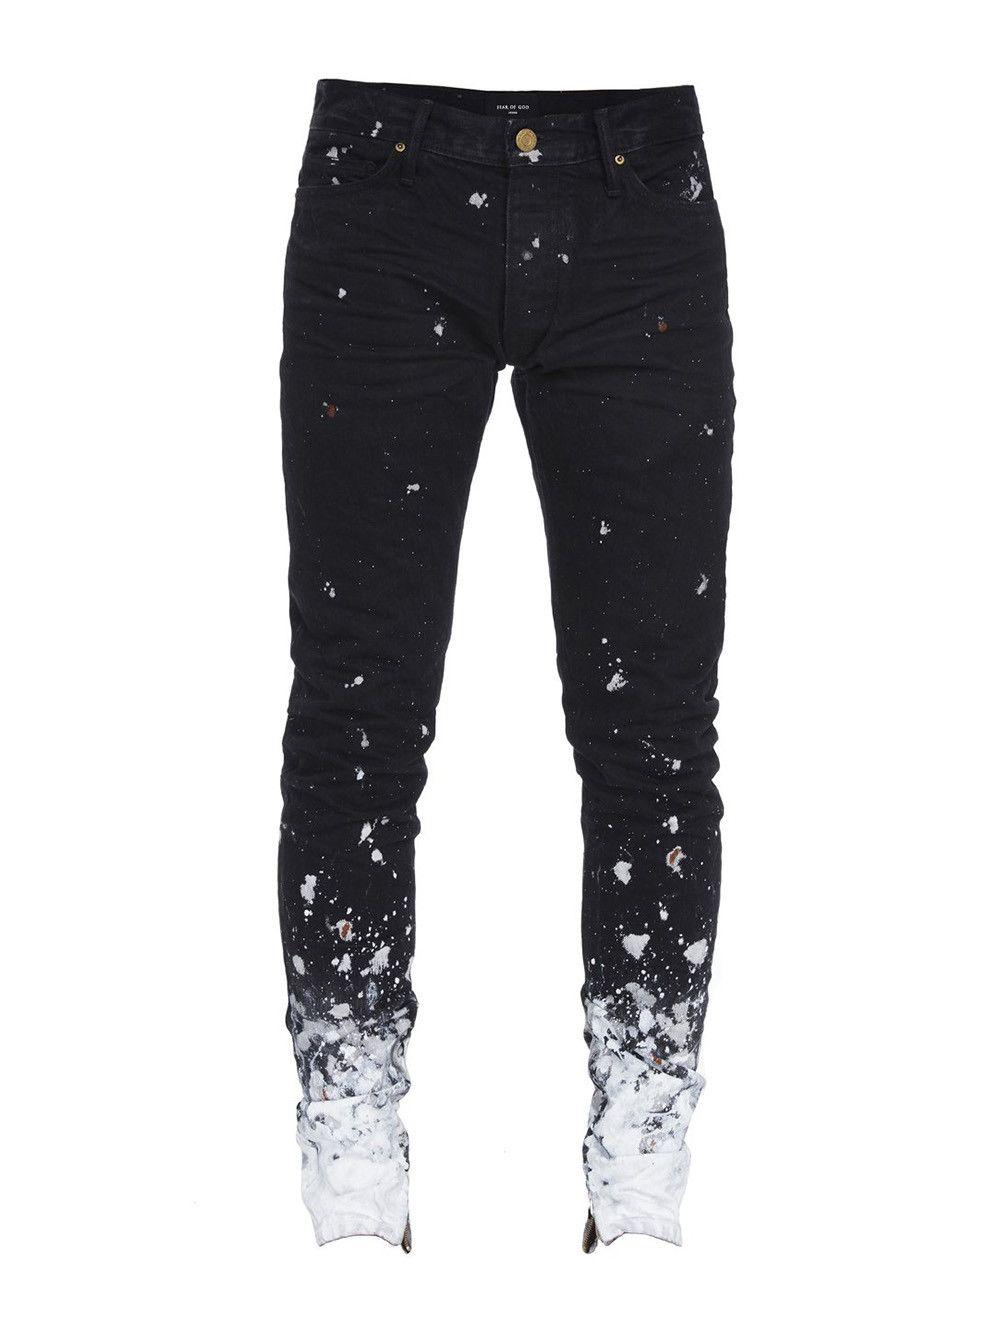 Fear Of God Skinny Fit Zip Detailed Painted Selvedge Denim Jeans In Black Romper Modesens パンツ パンク